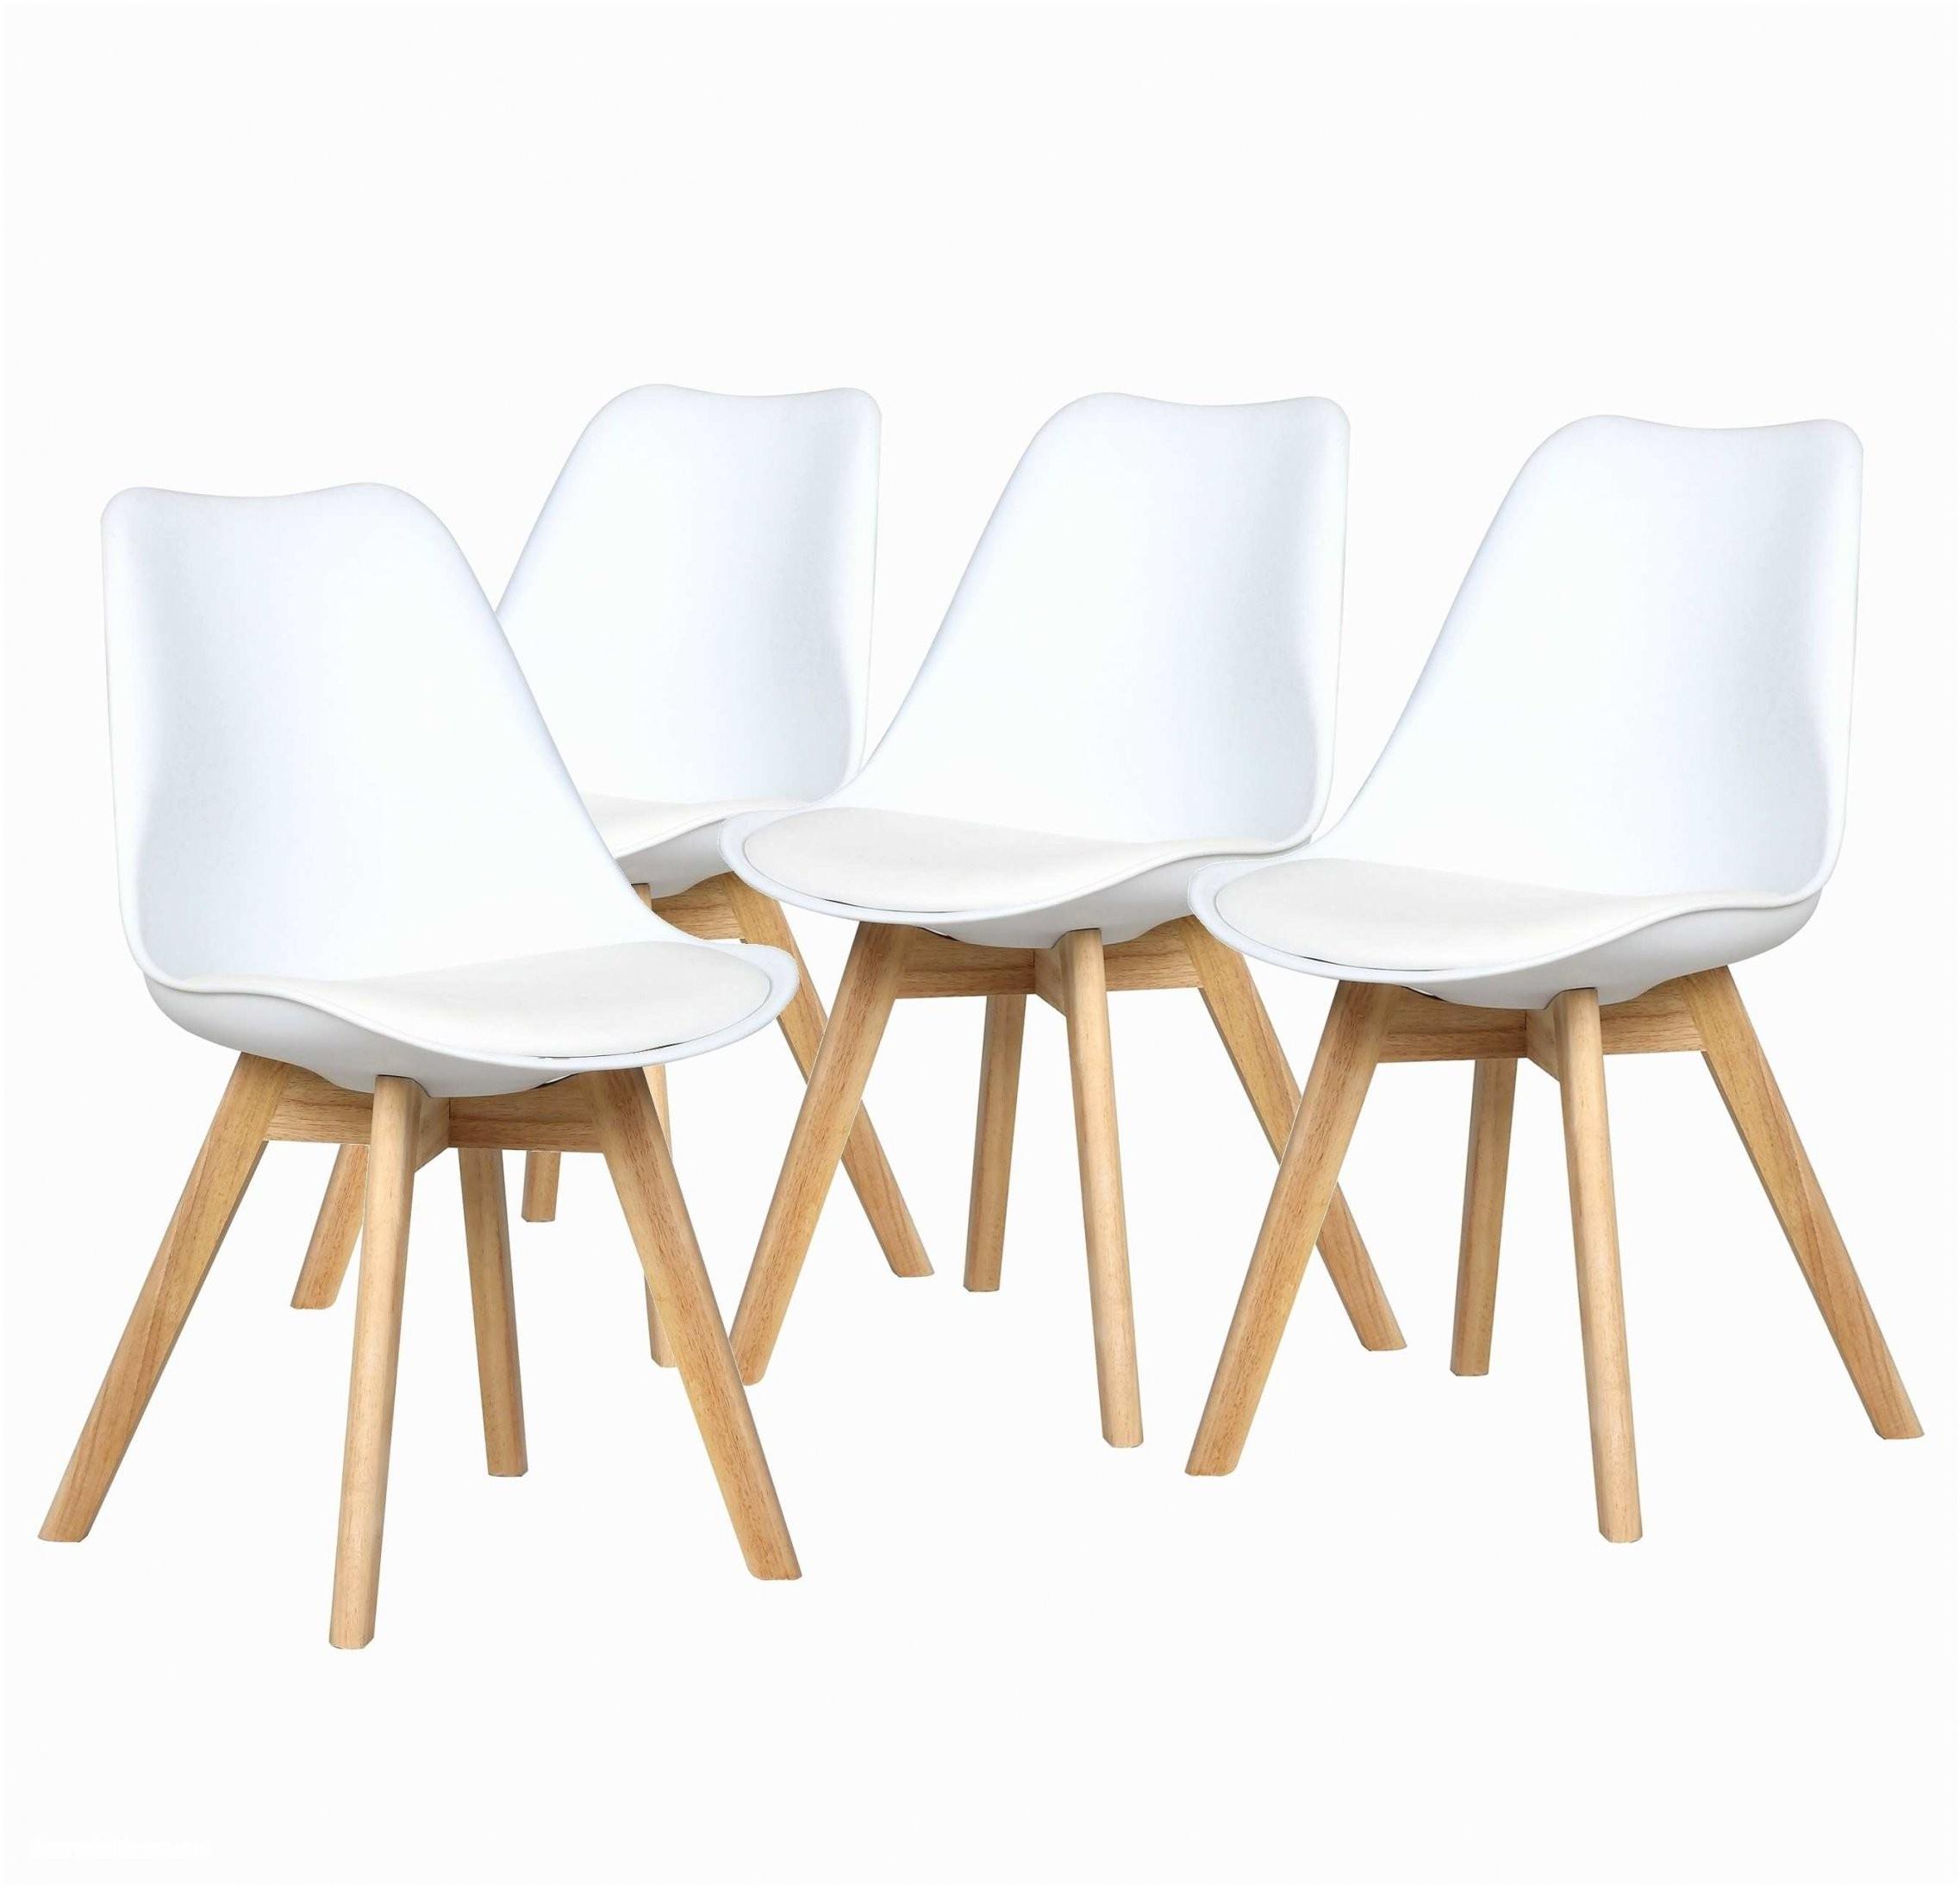 Elegant Skandinavische Stuhle Klassiker  Stuhl von Skandinavische Esszimmerstühle Photo